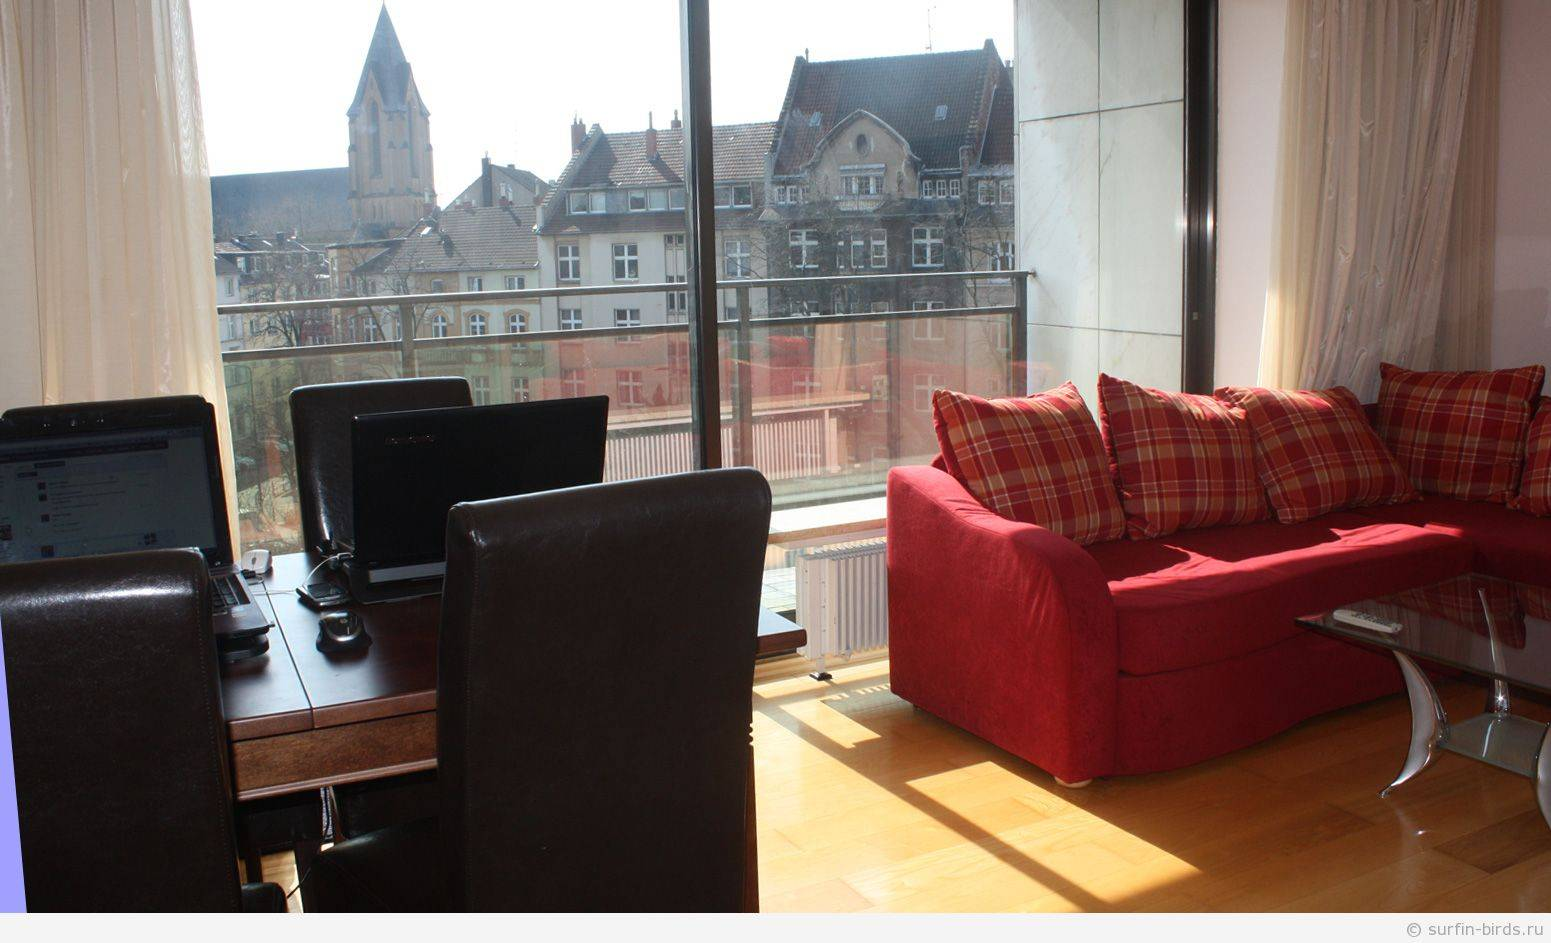 Аренда жилья в германии – юридические тонкости сдачи и съема квартиры